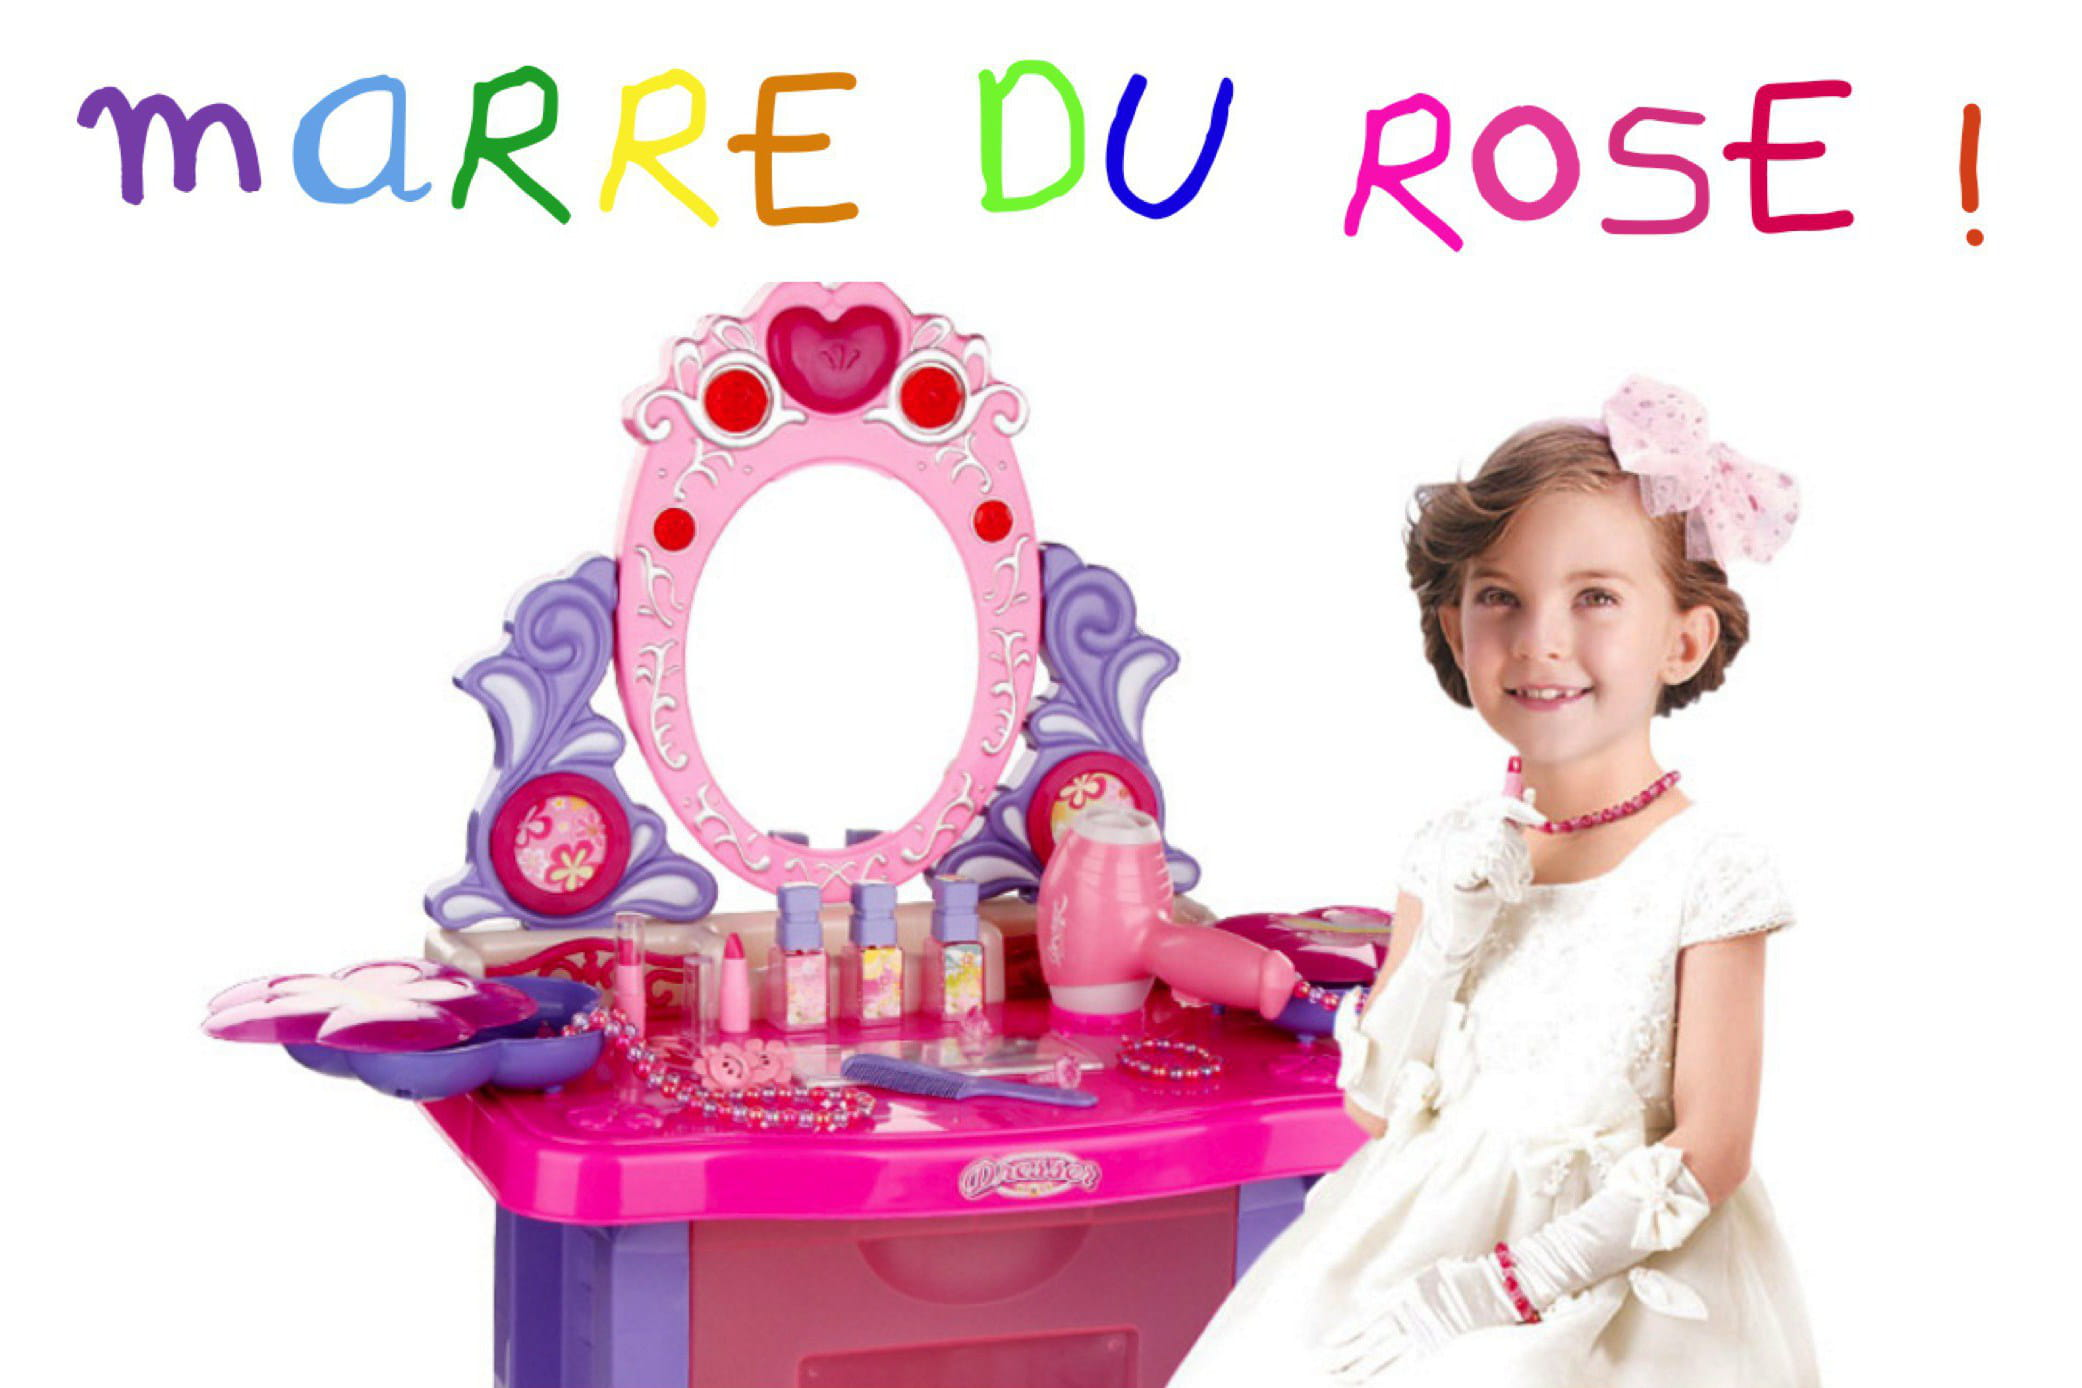 marre du rose la campagne contre les jouets st r otyp s journal des femmes. Black Bedroom Furniture Sets. Home Design Ideas